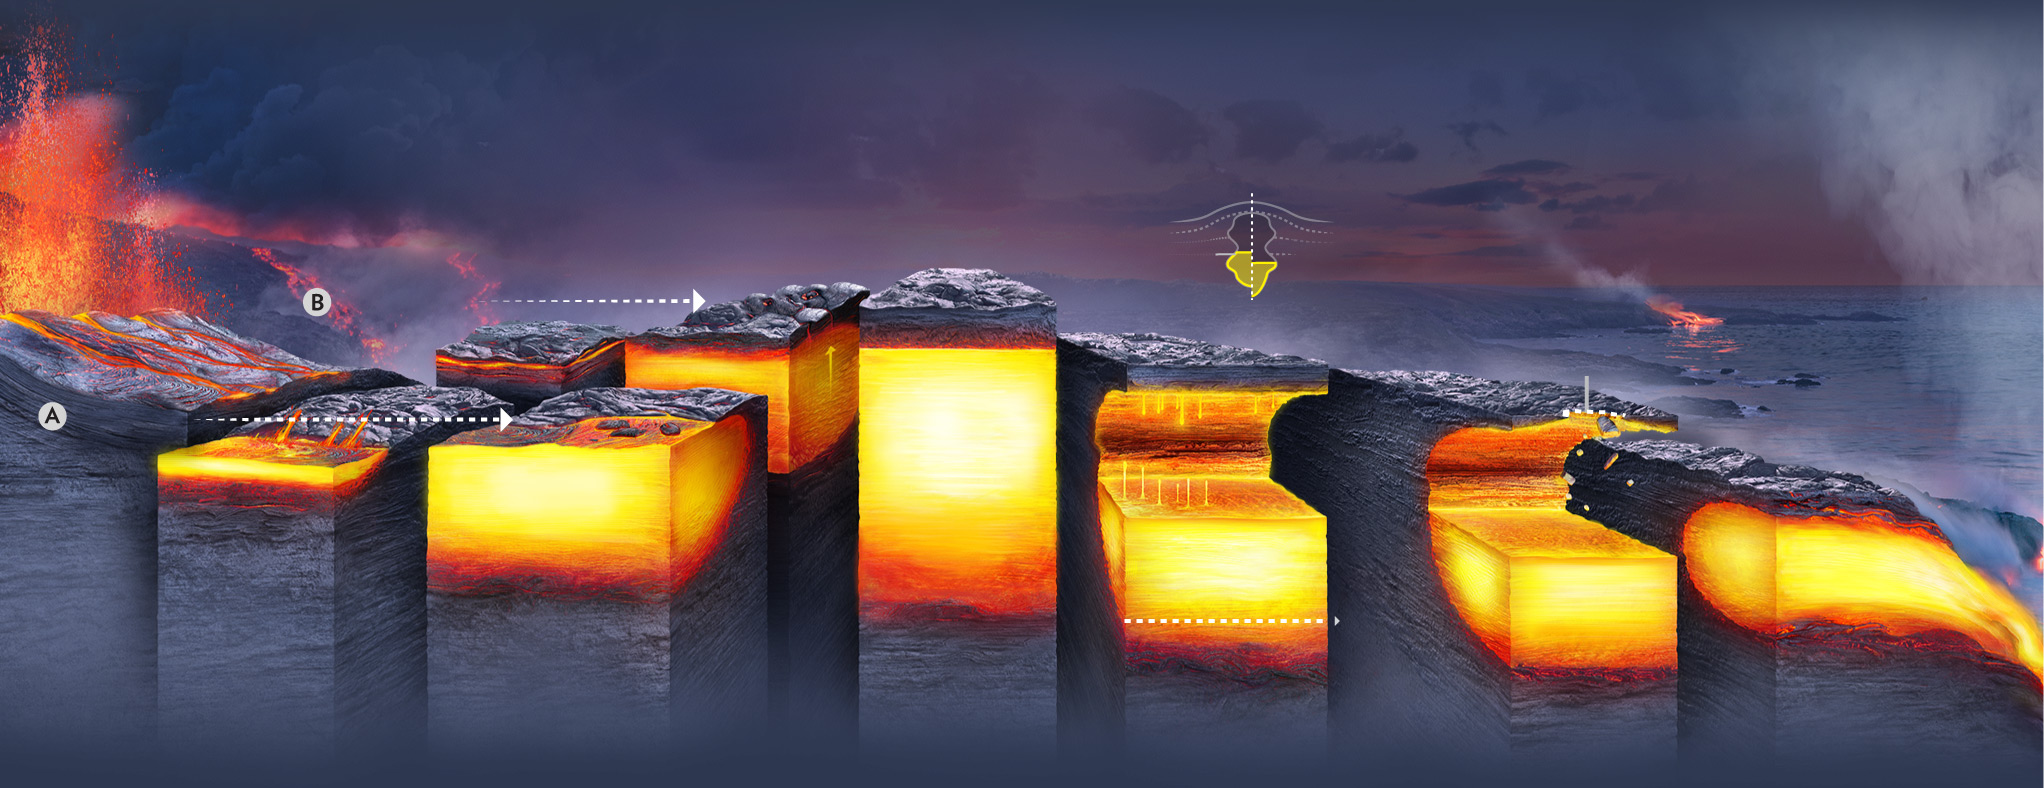 Lava tube - Wikipedia |Lava Tubes Are Formed How